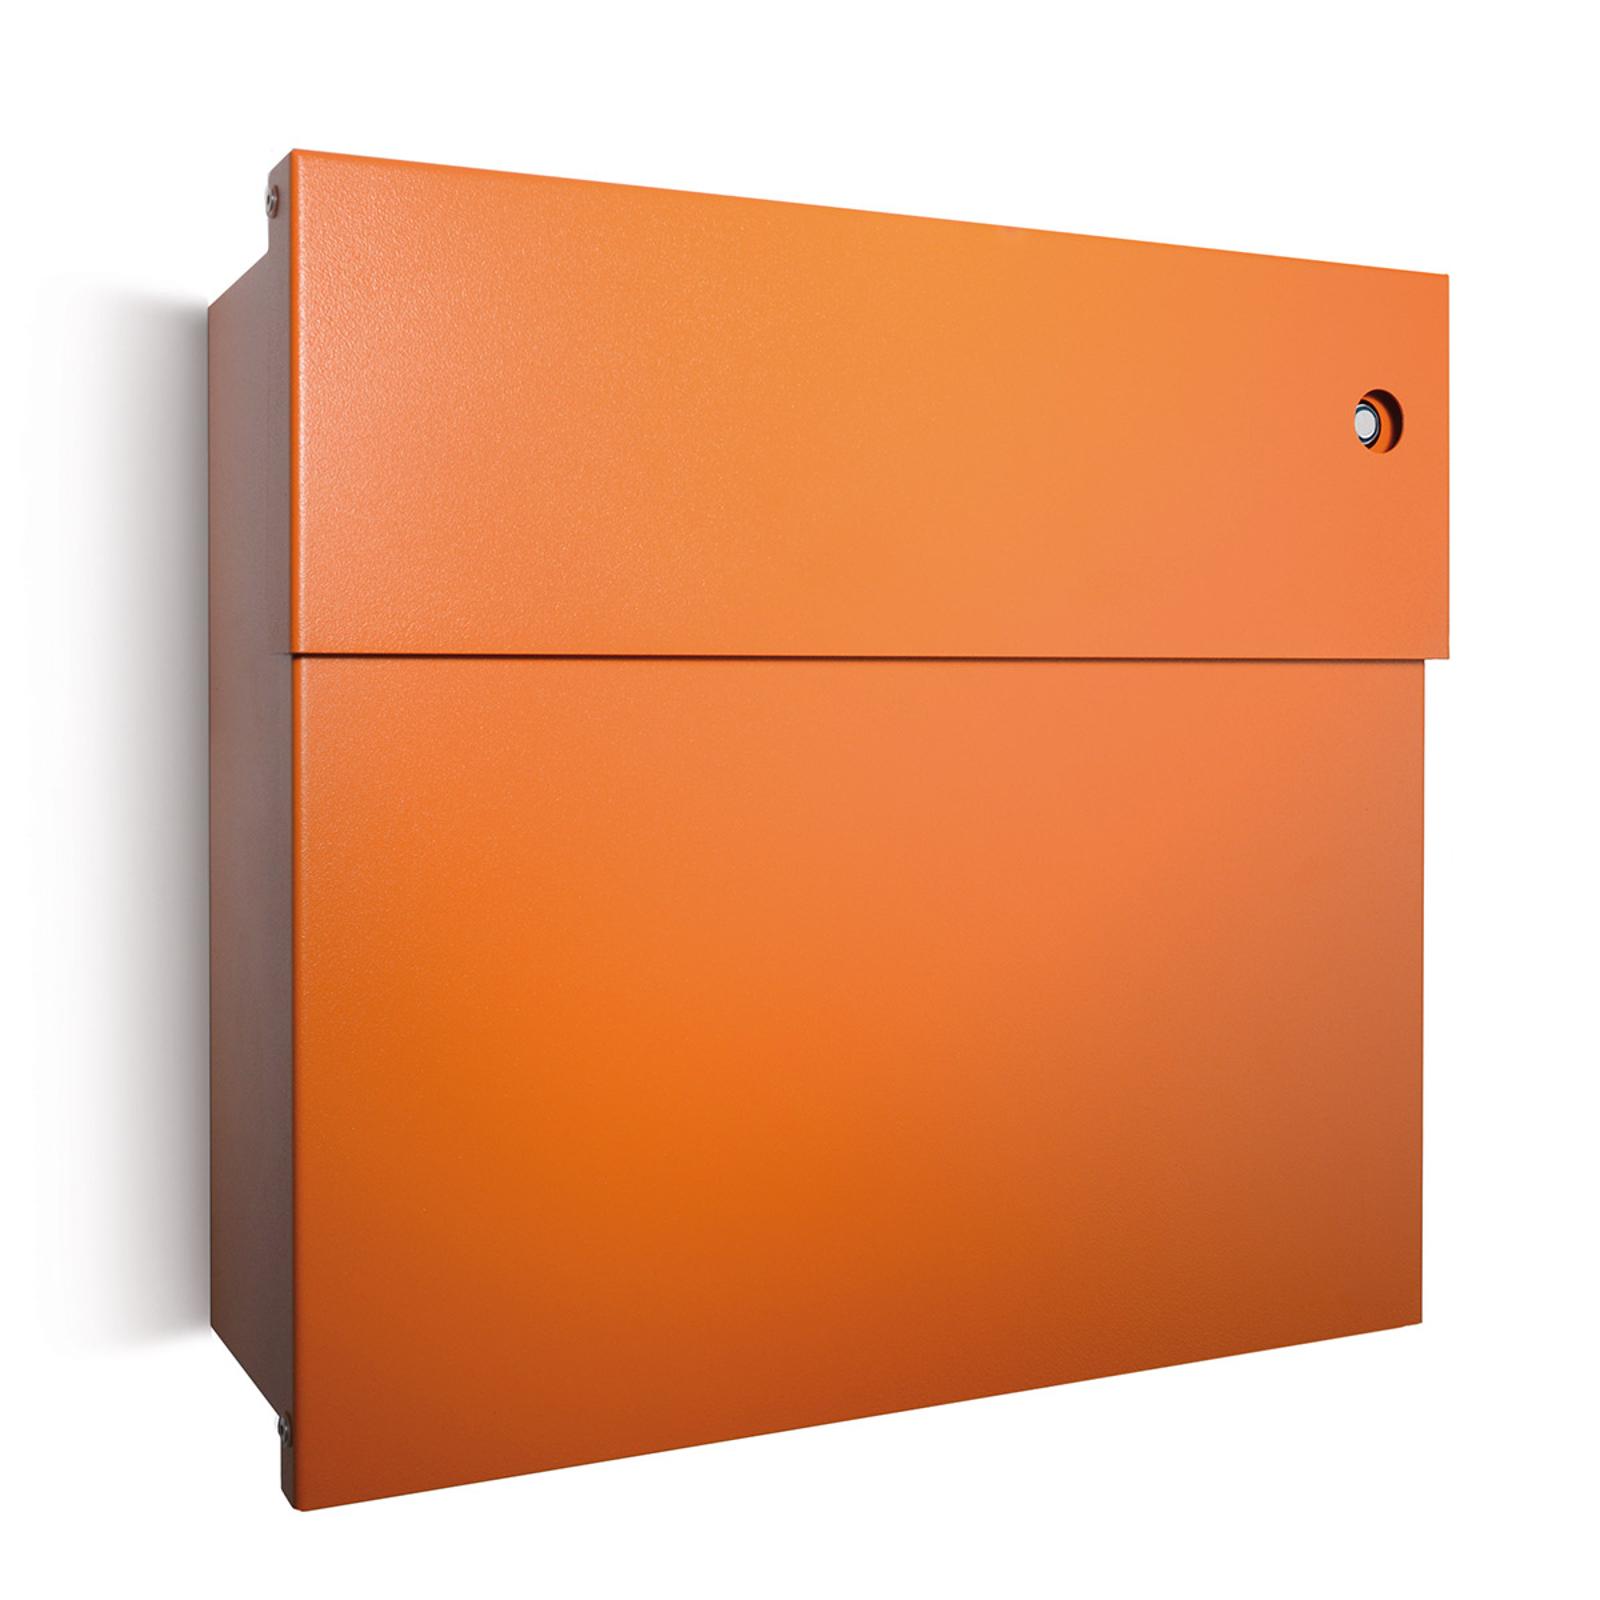 Brevlåda Letterman IV, blå ringklocka, orange